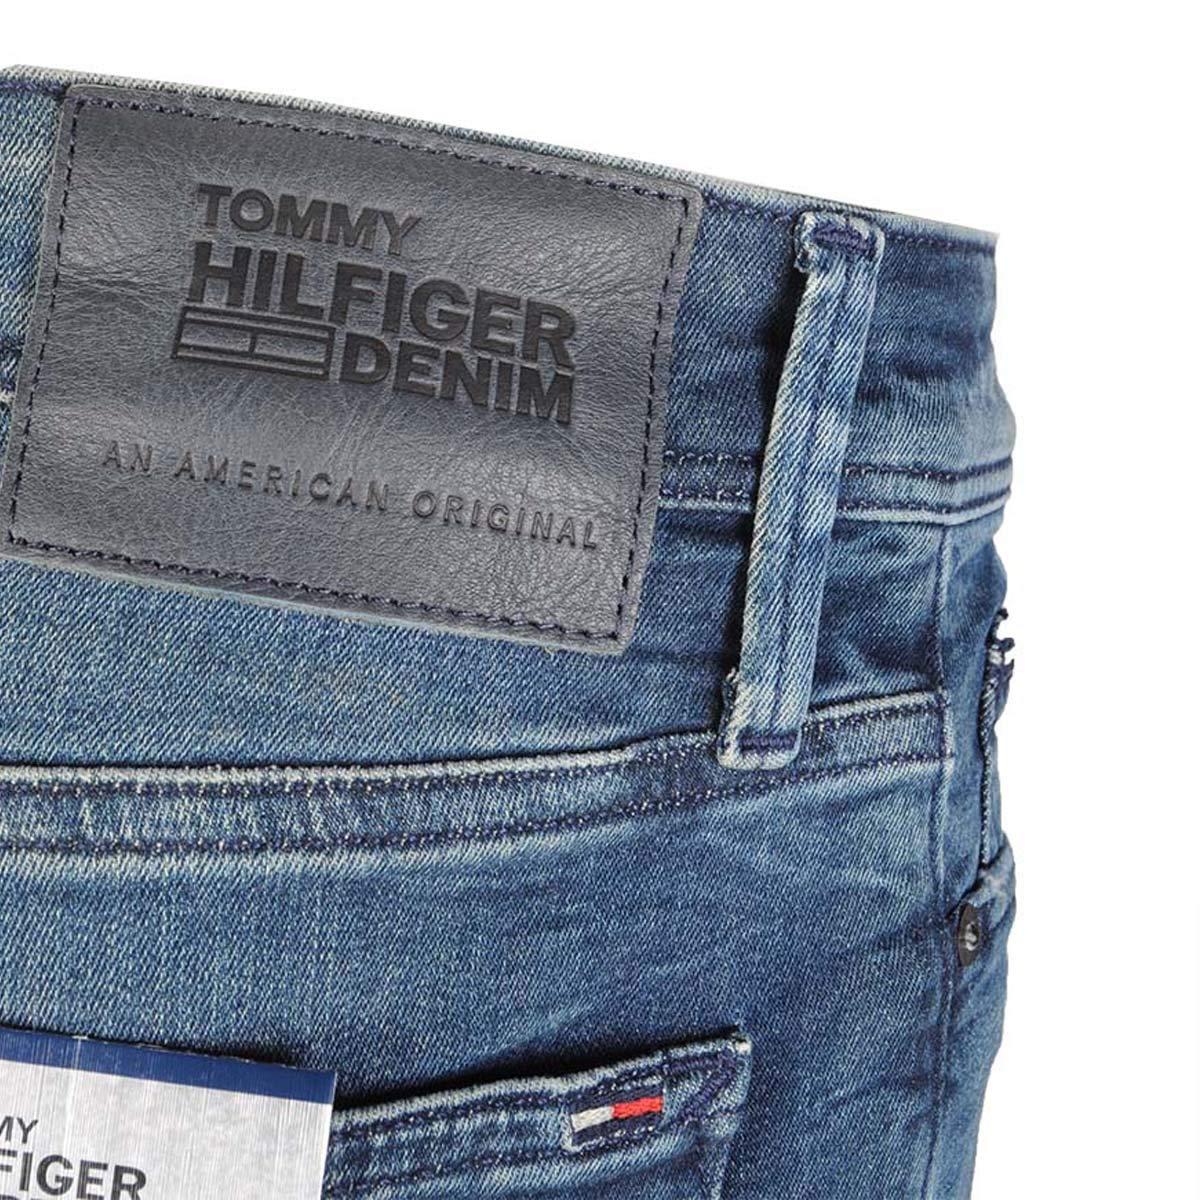 Hilfiger Denim, Herren Jeans Hose, Simon Skinny,Dynamic Stretch Denim,Dynamic Aged Blue [19024]